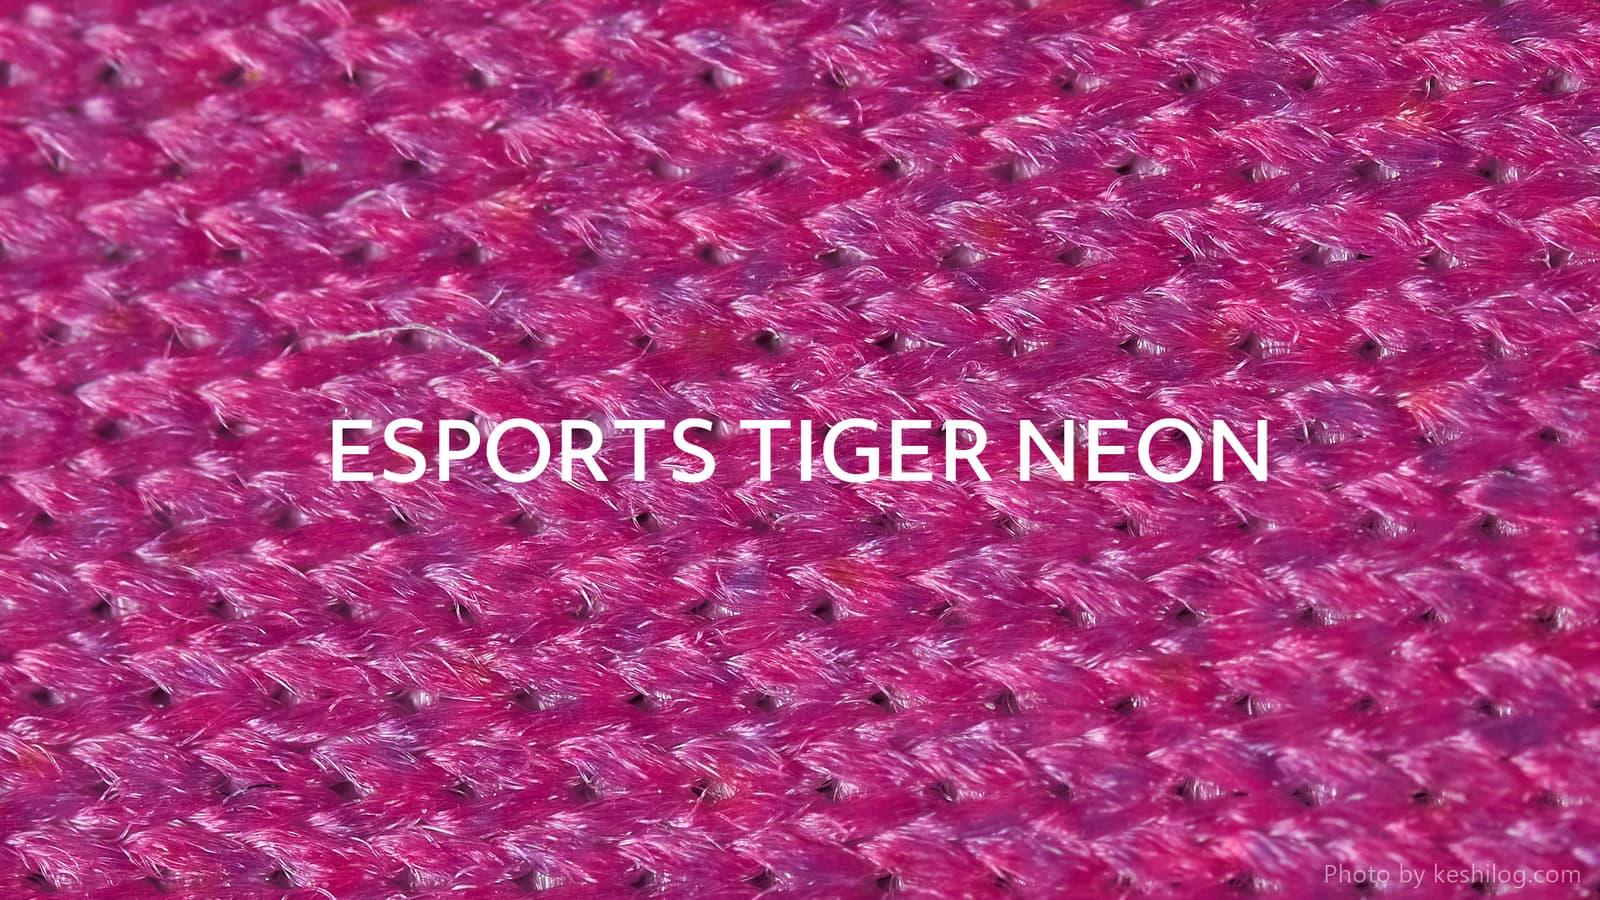 esports tiger neon 表面の拡大写真